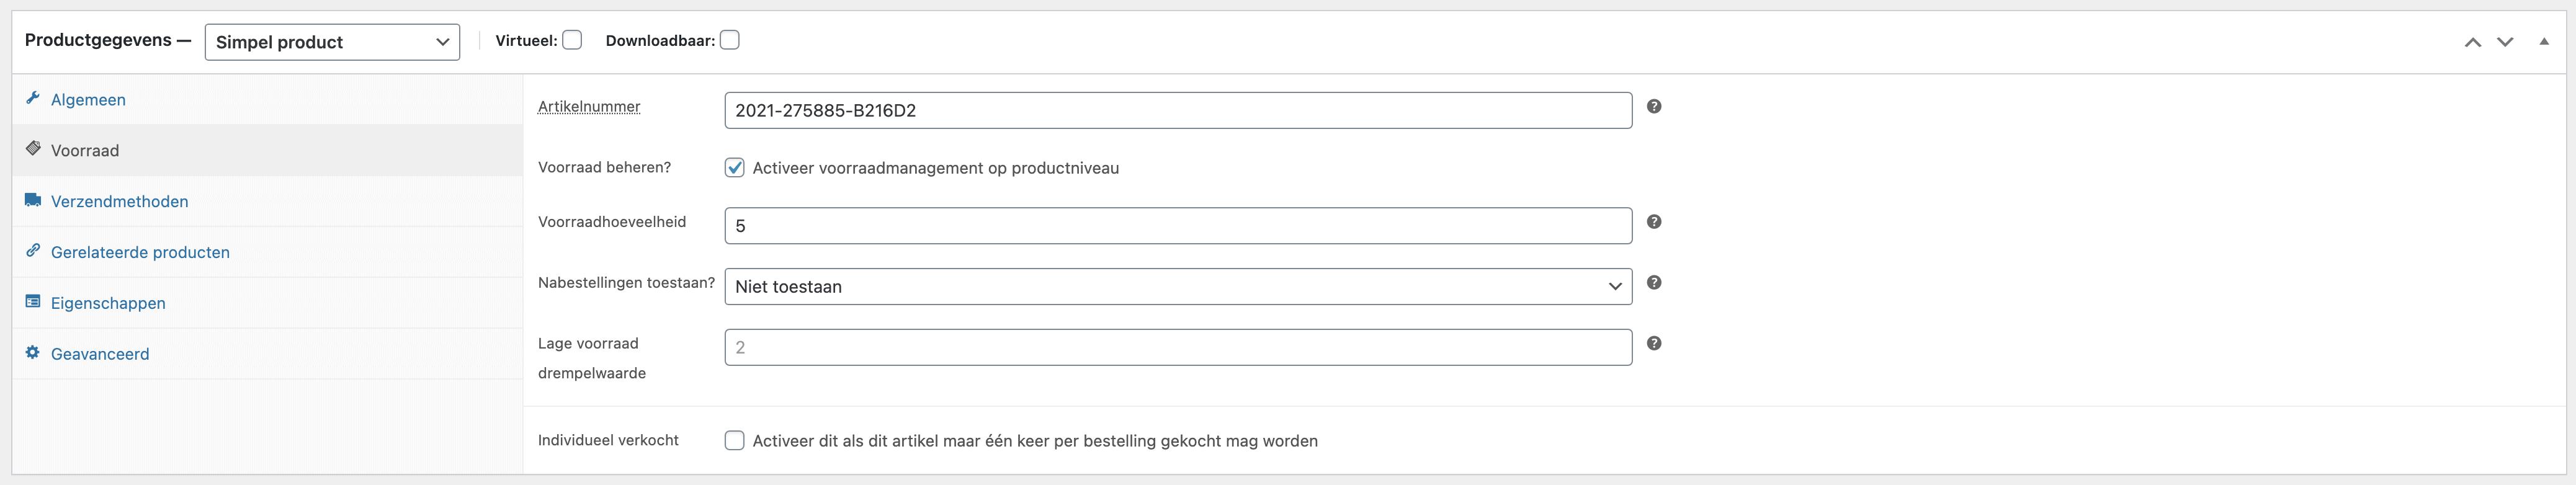 woocommerce-simple-product-toevoegen-productgegevens-voorraad